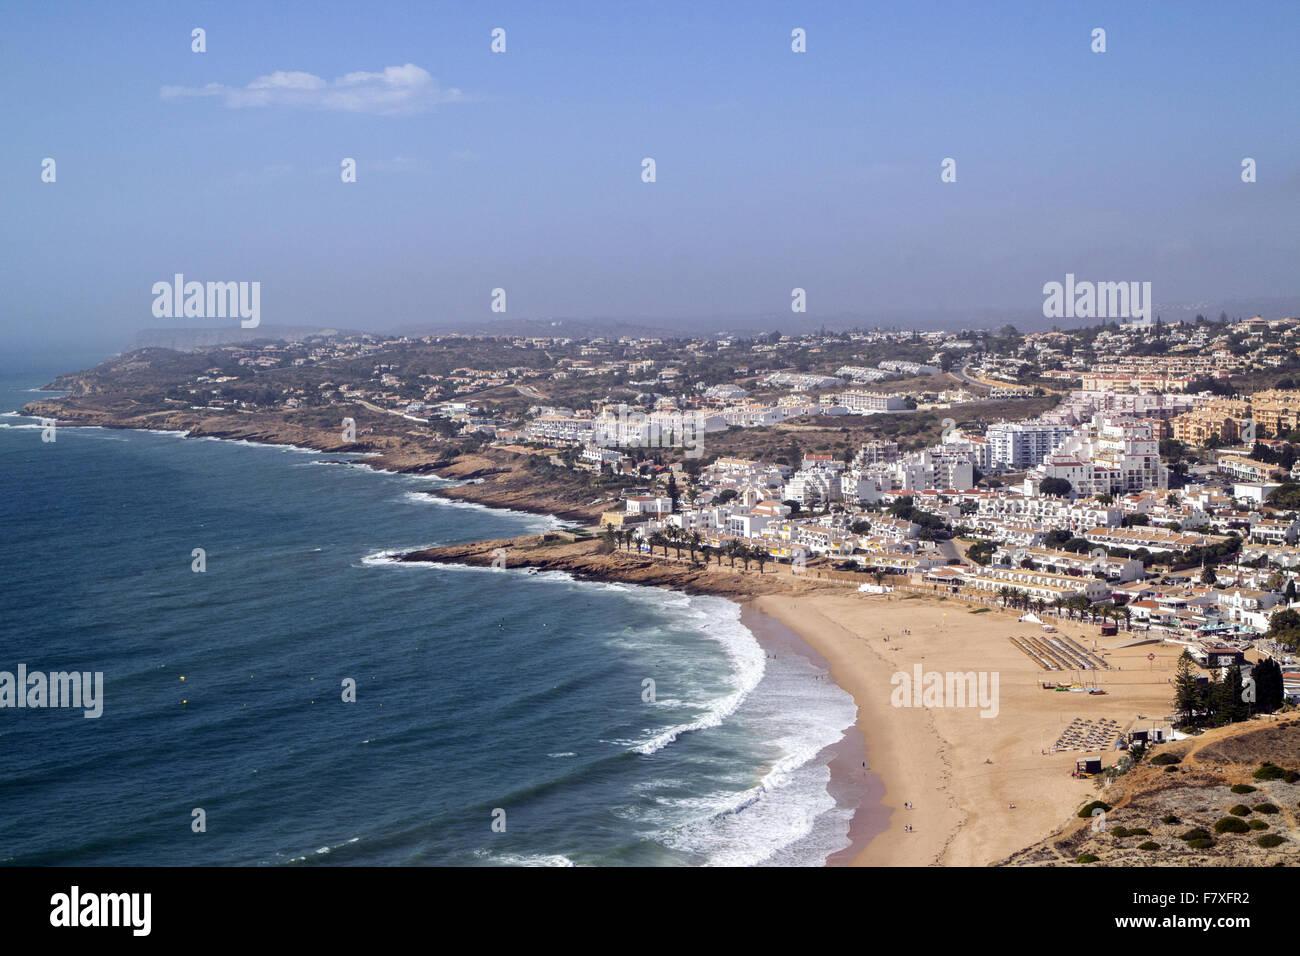 The holiday resort of Praia da Luz, officially Luz, near Lagos in the Algarve,  Portugal. - Stock Image